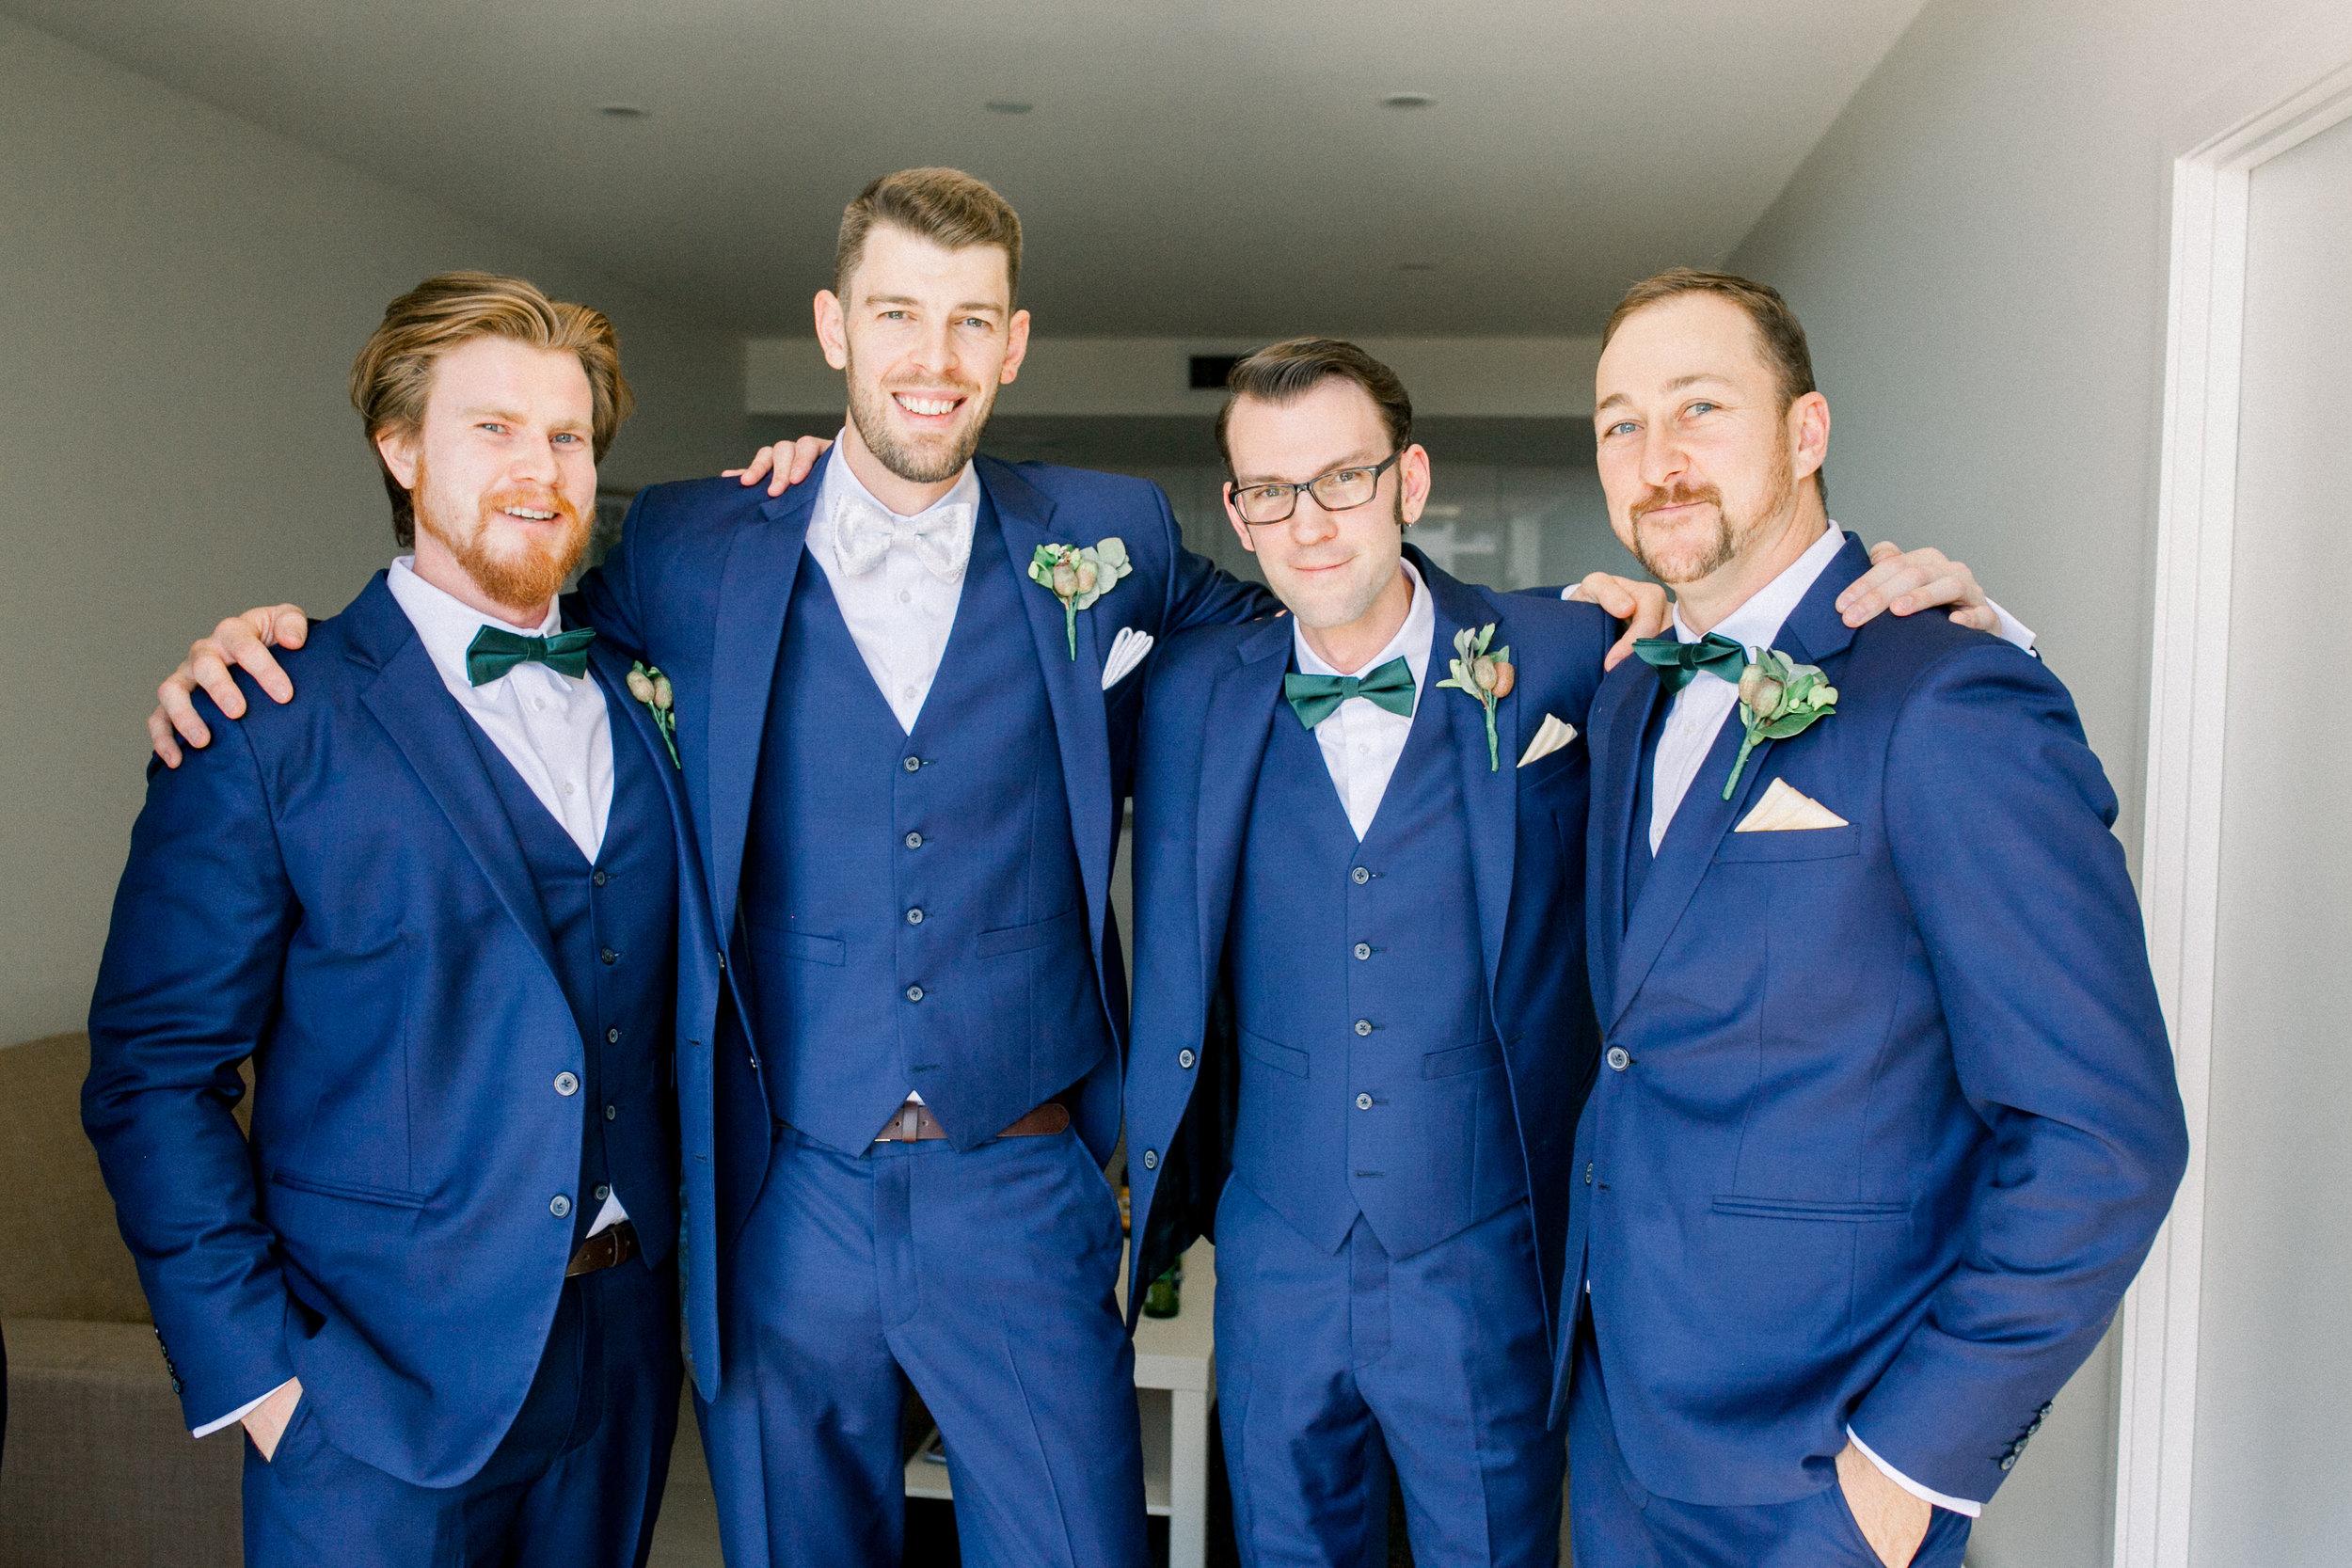 brisbane-city-wedding-photography-the-loft-1-19.jpg